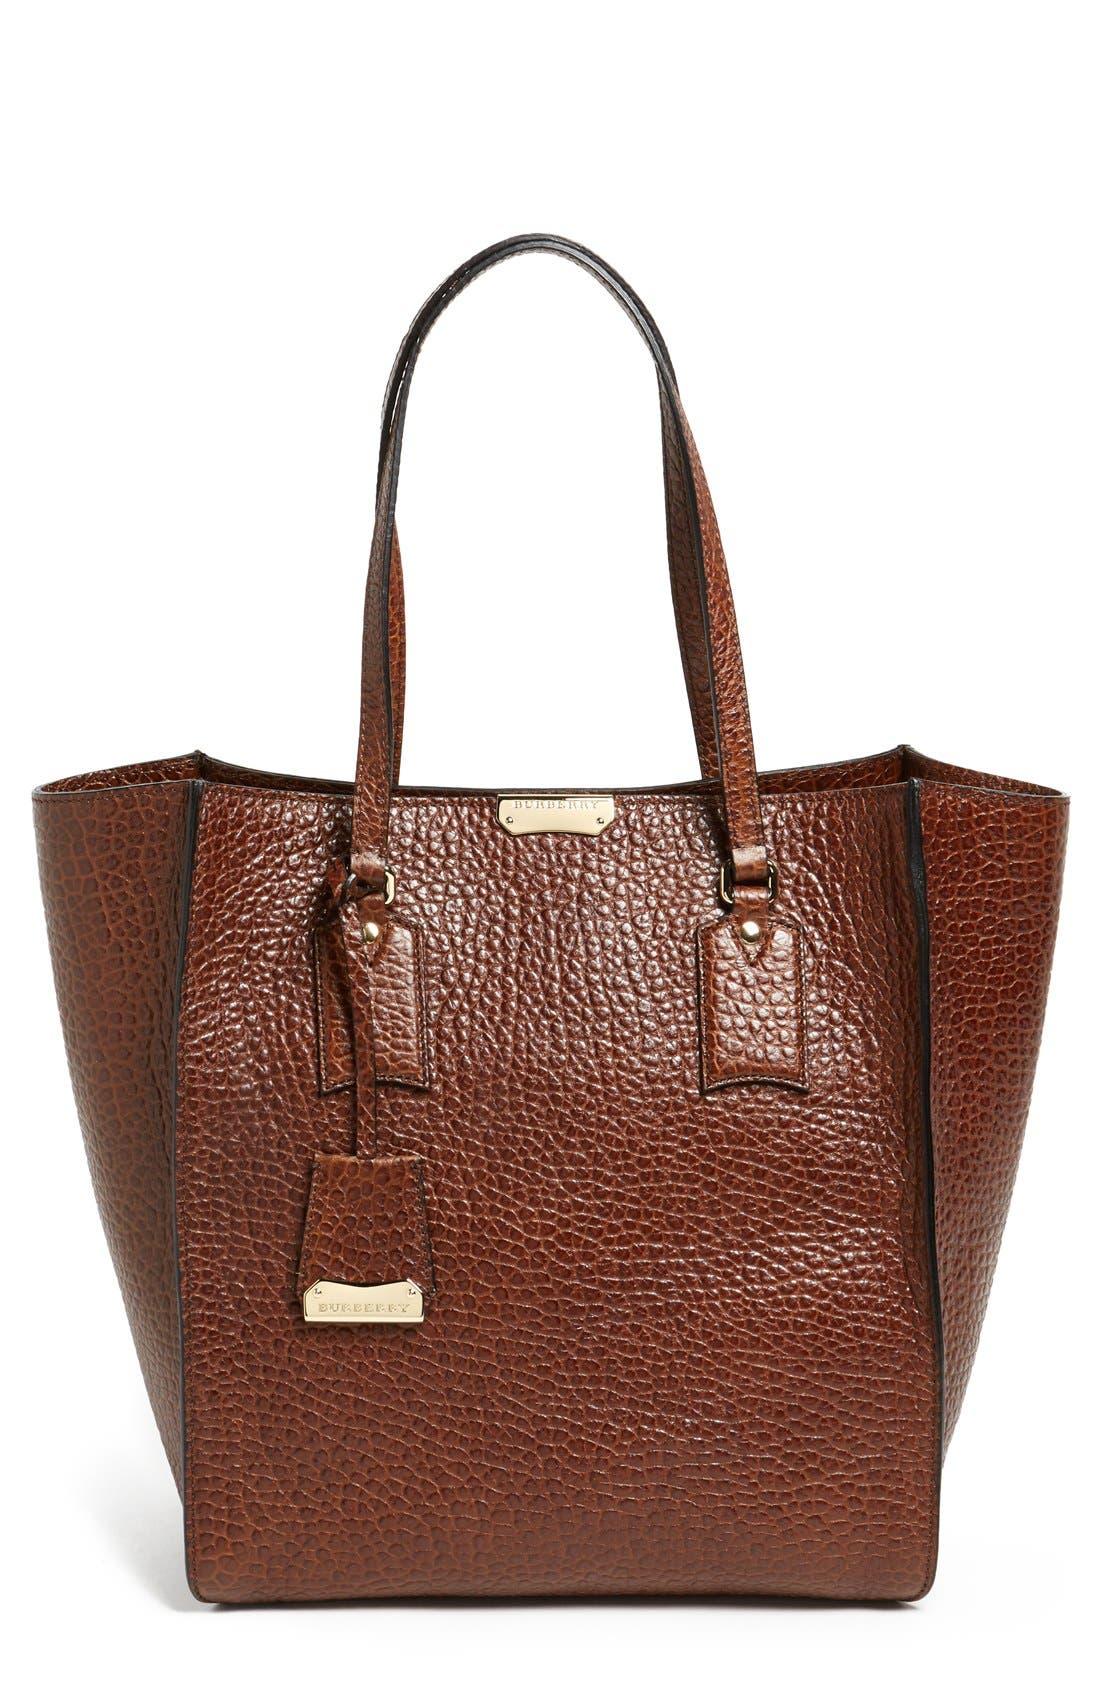 Main Image - Burberry 'Woodbury - Medium' Leather Tote